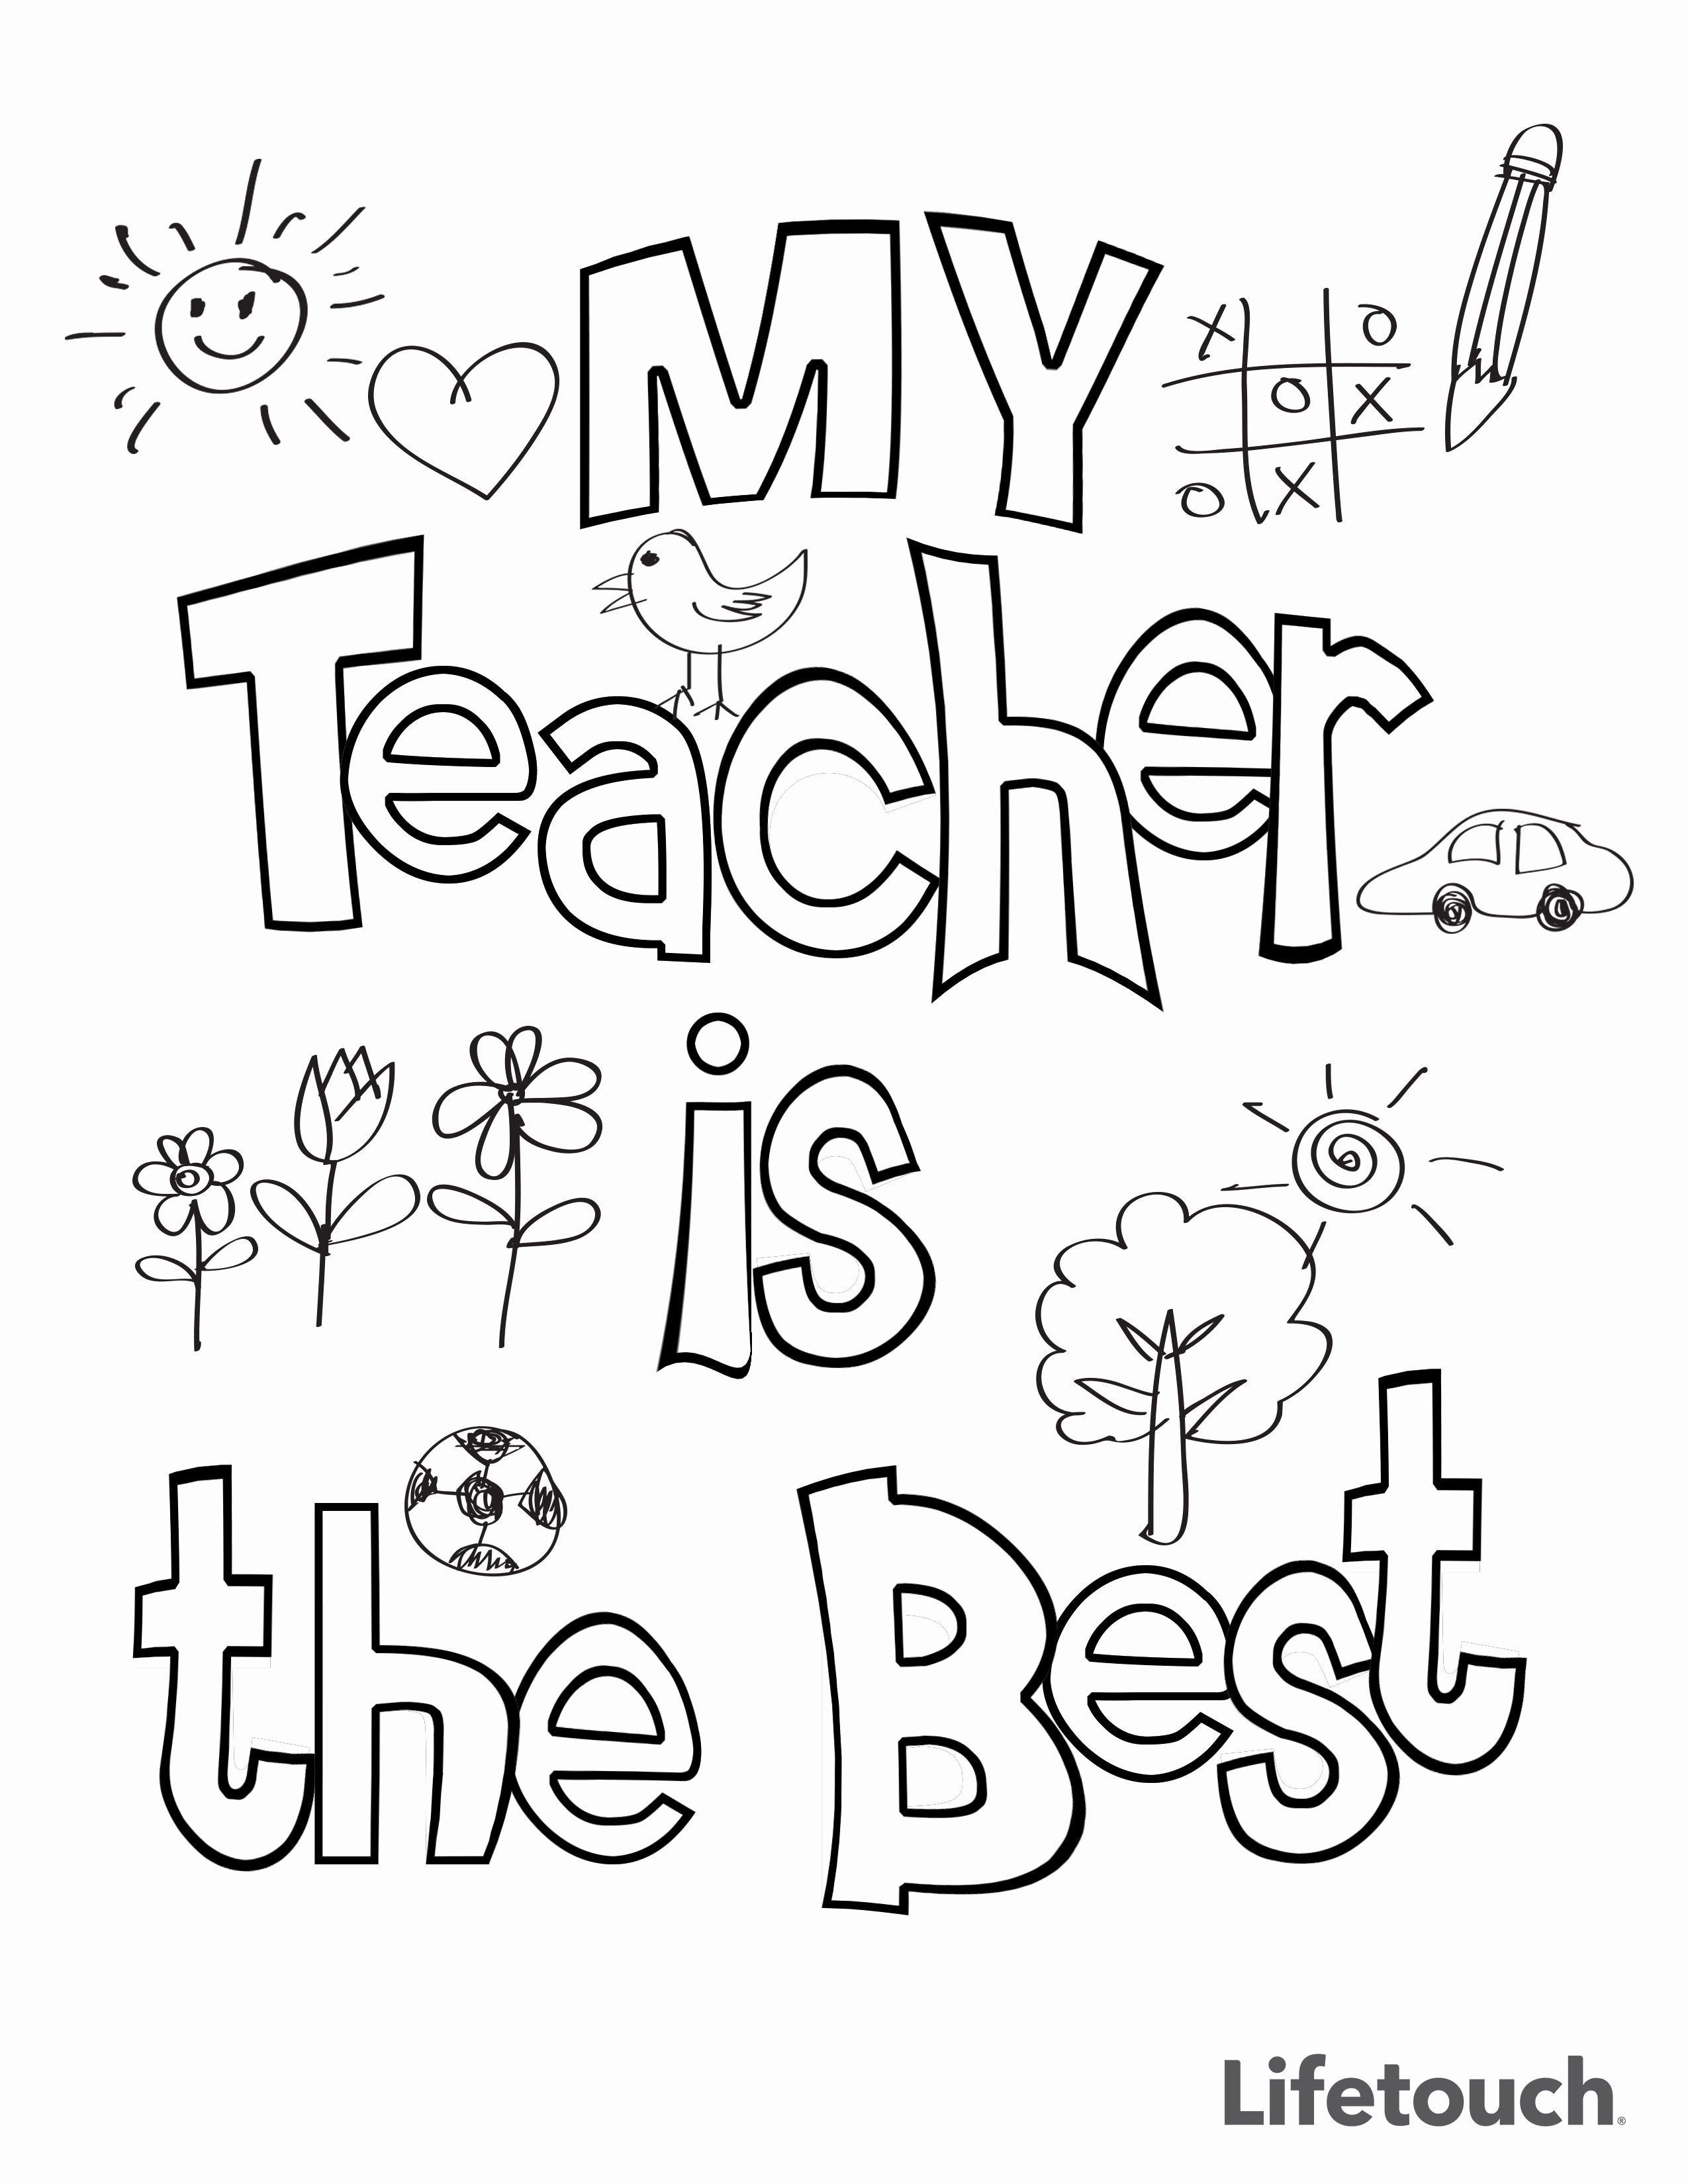 Teacher Appreciation Printables Inspirational Teacher Appreciation In 2020 Teacher Appreciation Printables Teacher Appreciation Cards Teachers Appreciation Week Gifts